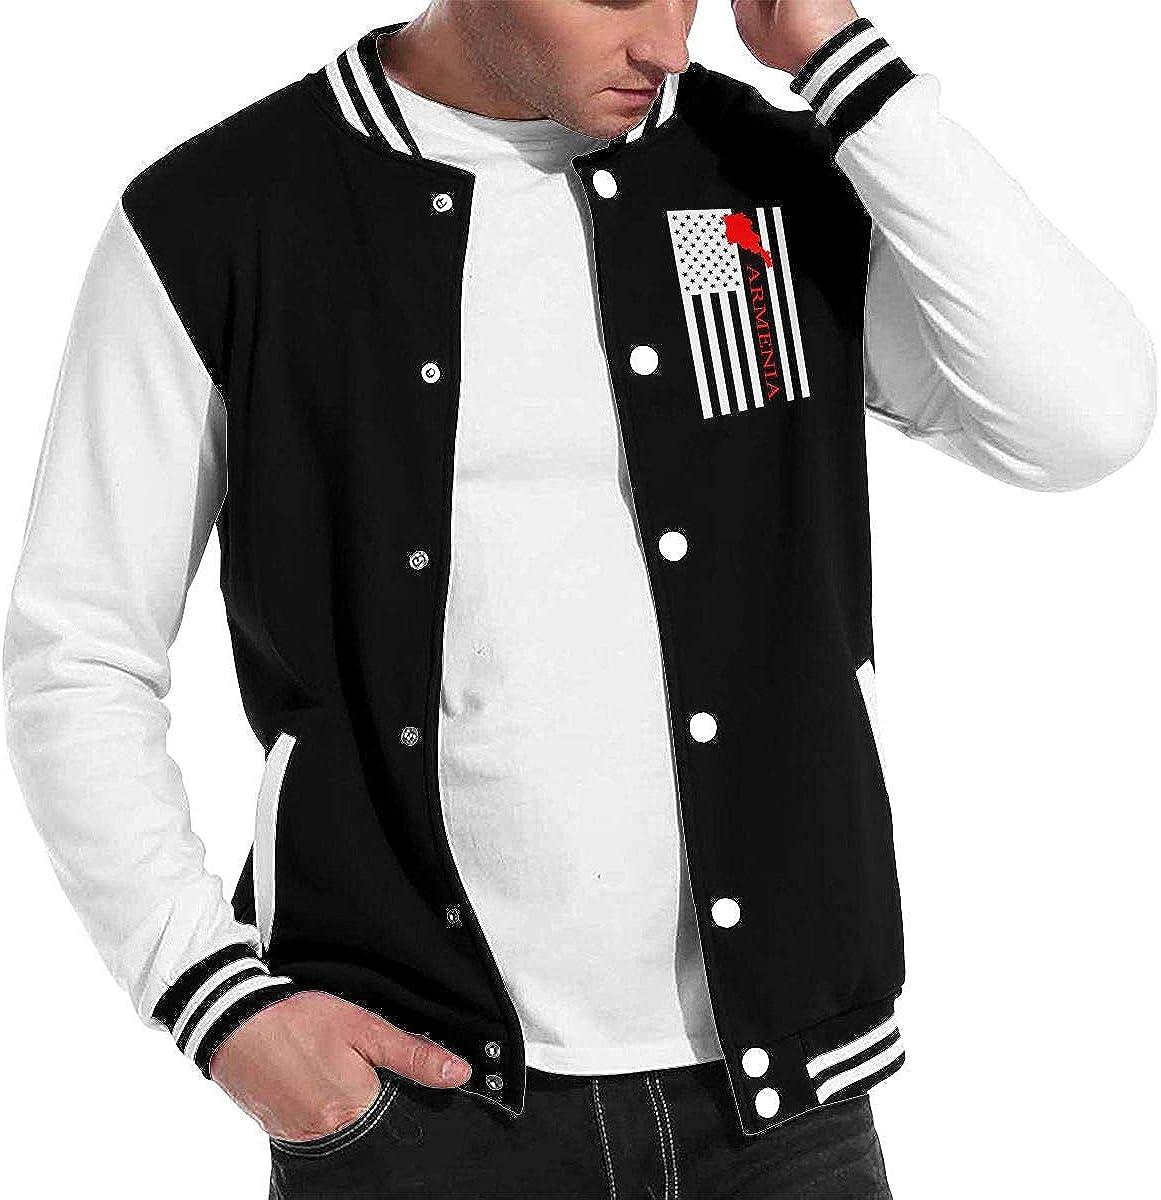 Armenian National Emblem Unisex Baseball Uniform Jacket Sweatshirt Sport Coat